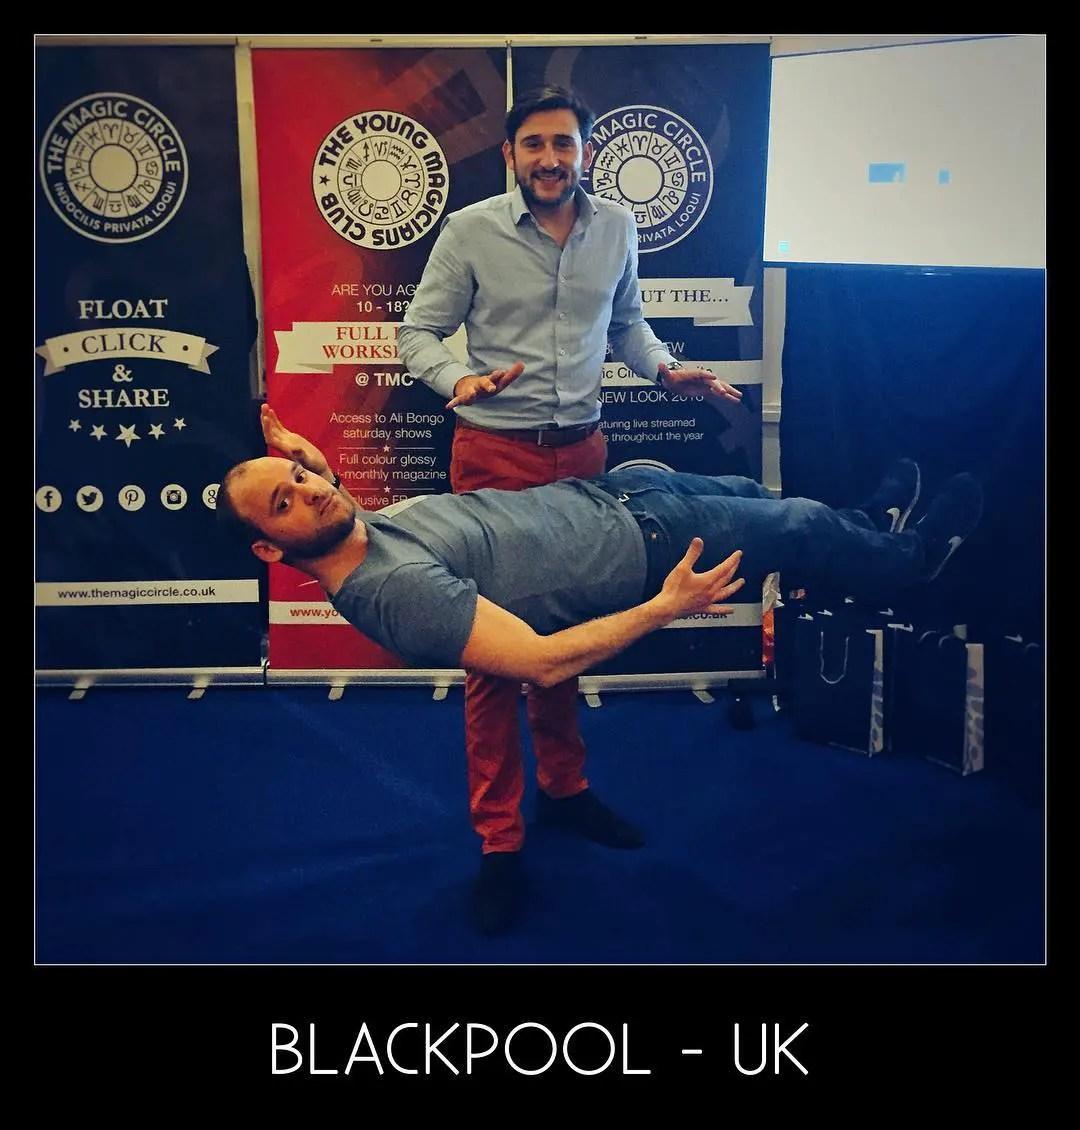 Tom Le Magicien - Flying Blackpool